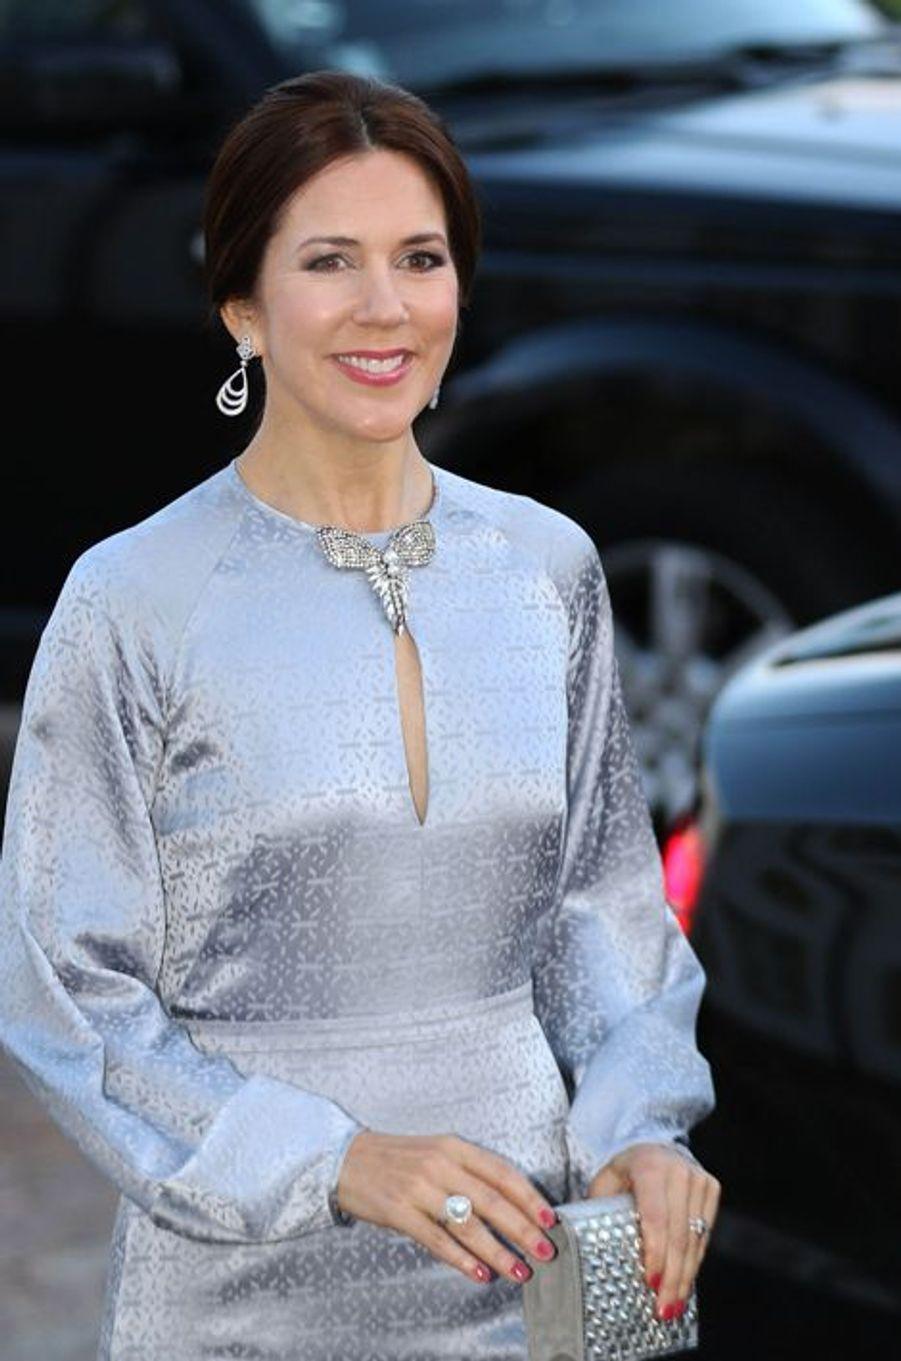 La princesse Mary de Danemark à Fredensborg, le 16 avril 2015